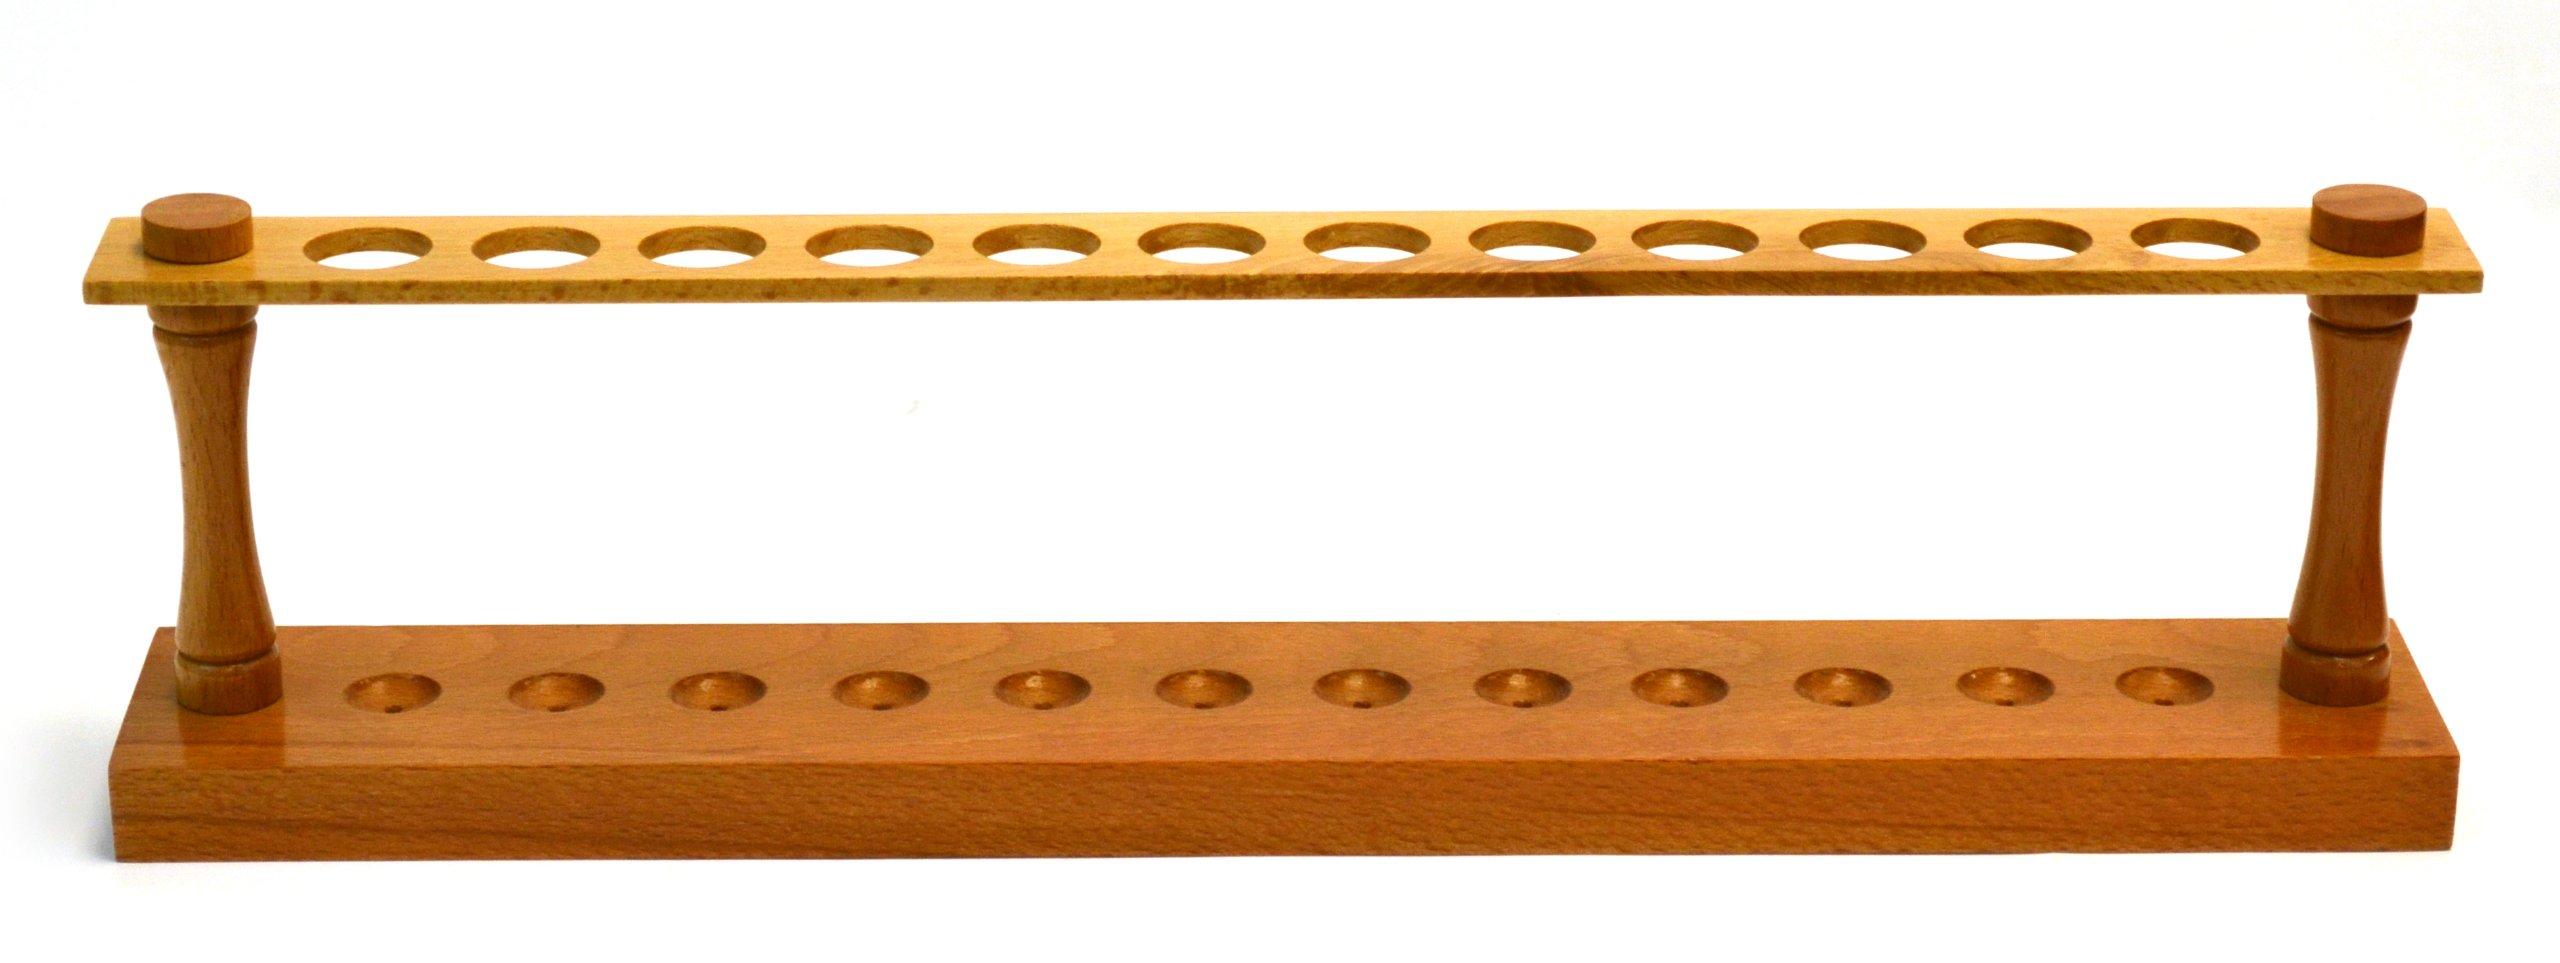 Eisco Labs Premium Wooden Test Tube Rack, (12) 22mm Holes, 16.75'' Long